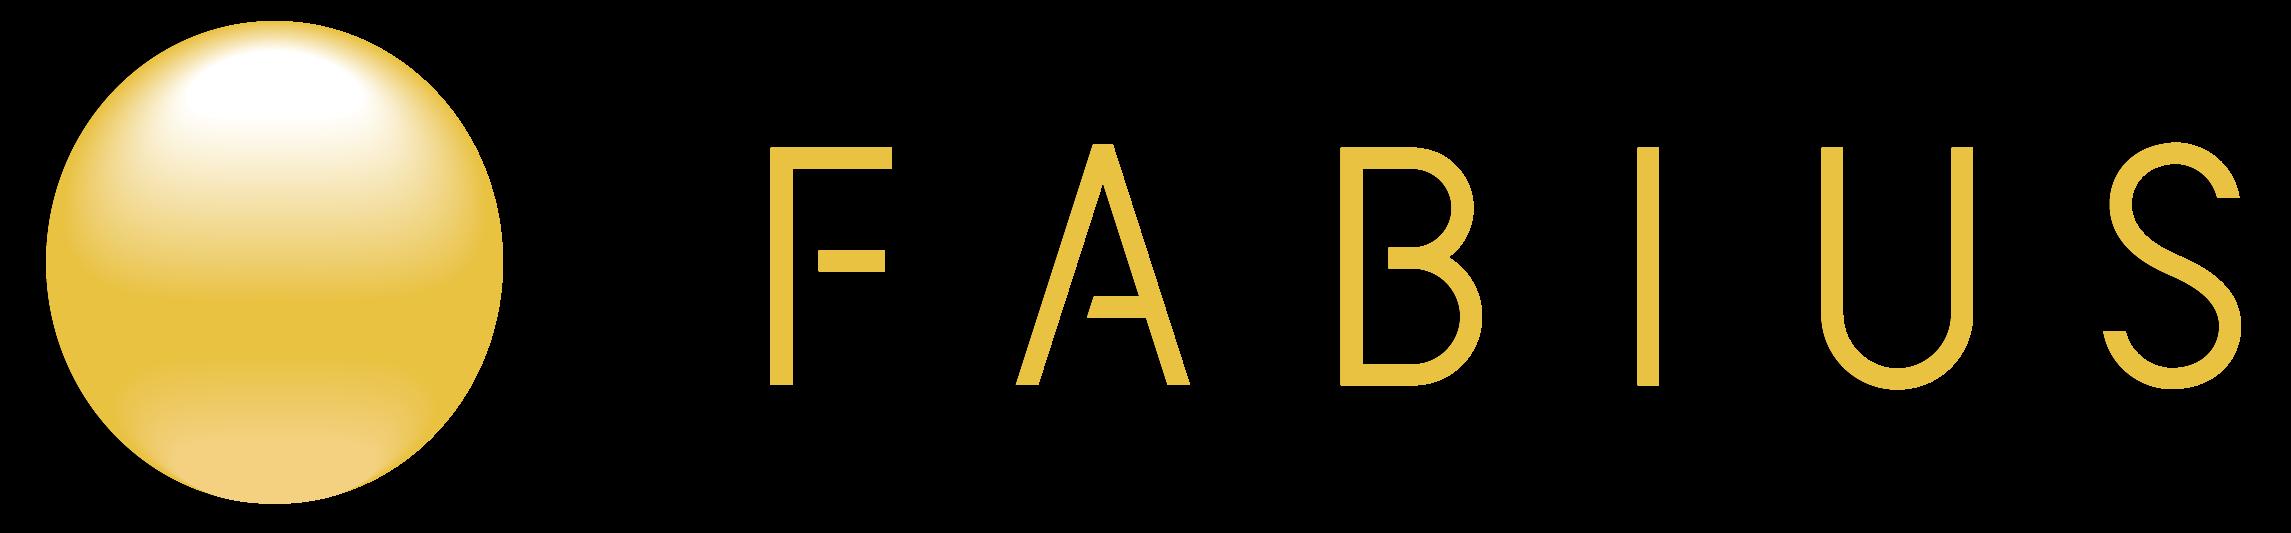 cropped-FABIUS_ロゴ.png